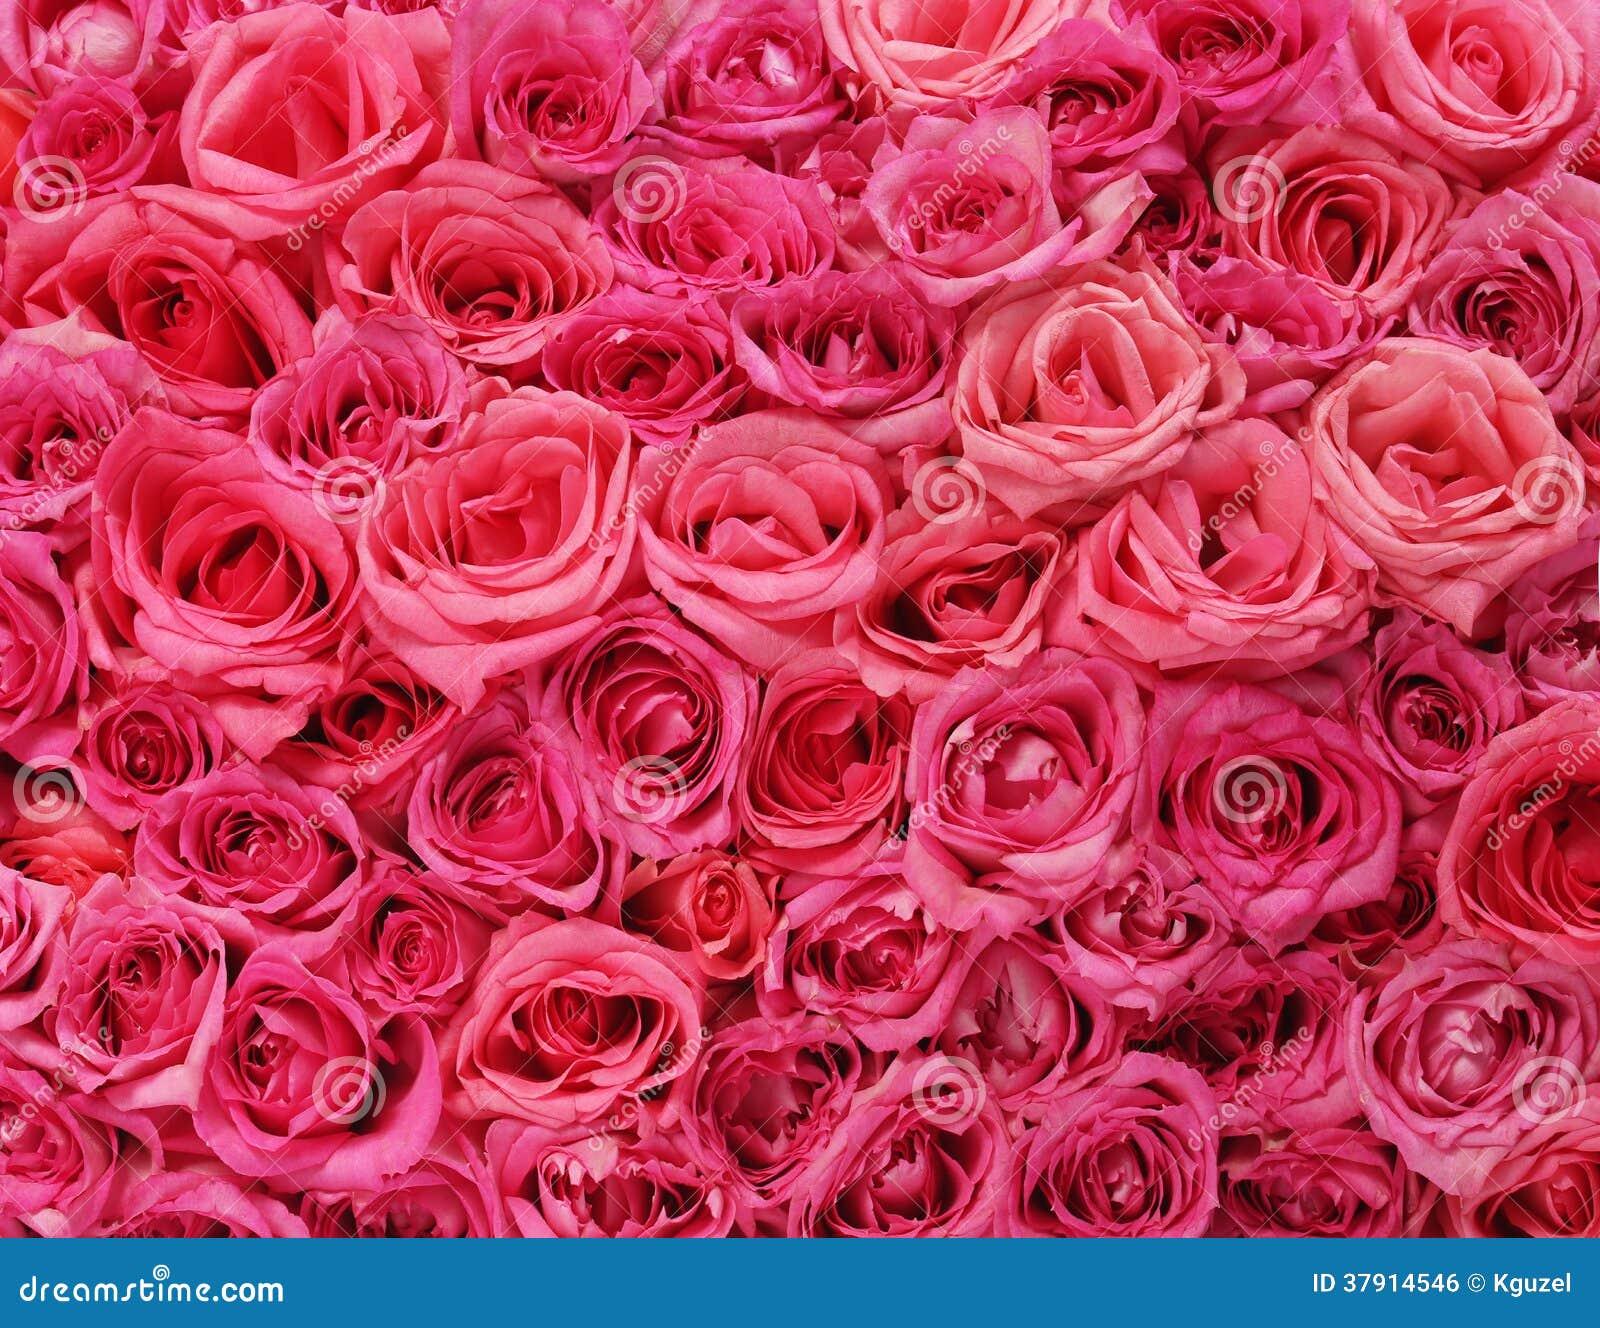 Hot pink flowers background lektonfo hot pink flowers background pink roses background mightylinksfo